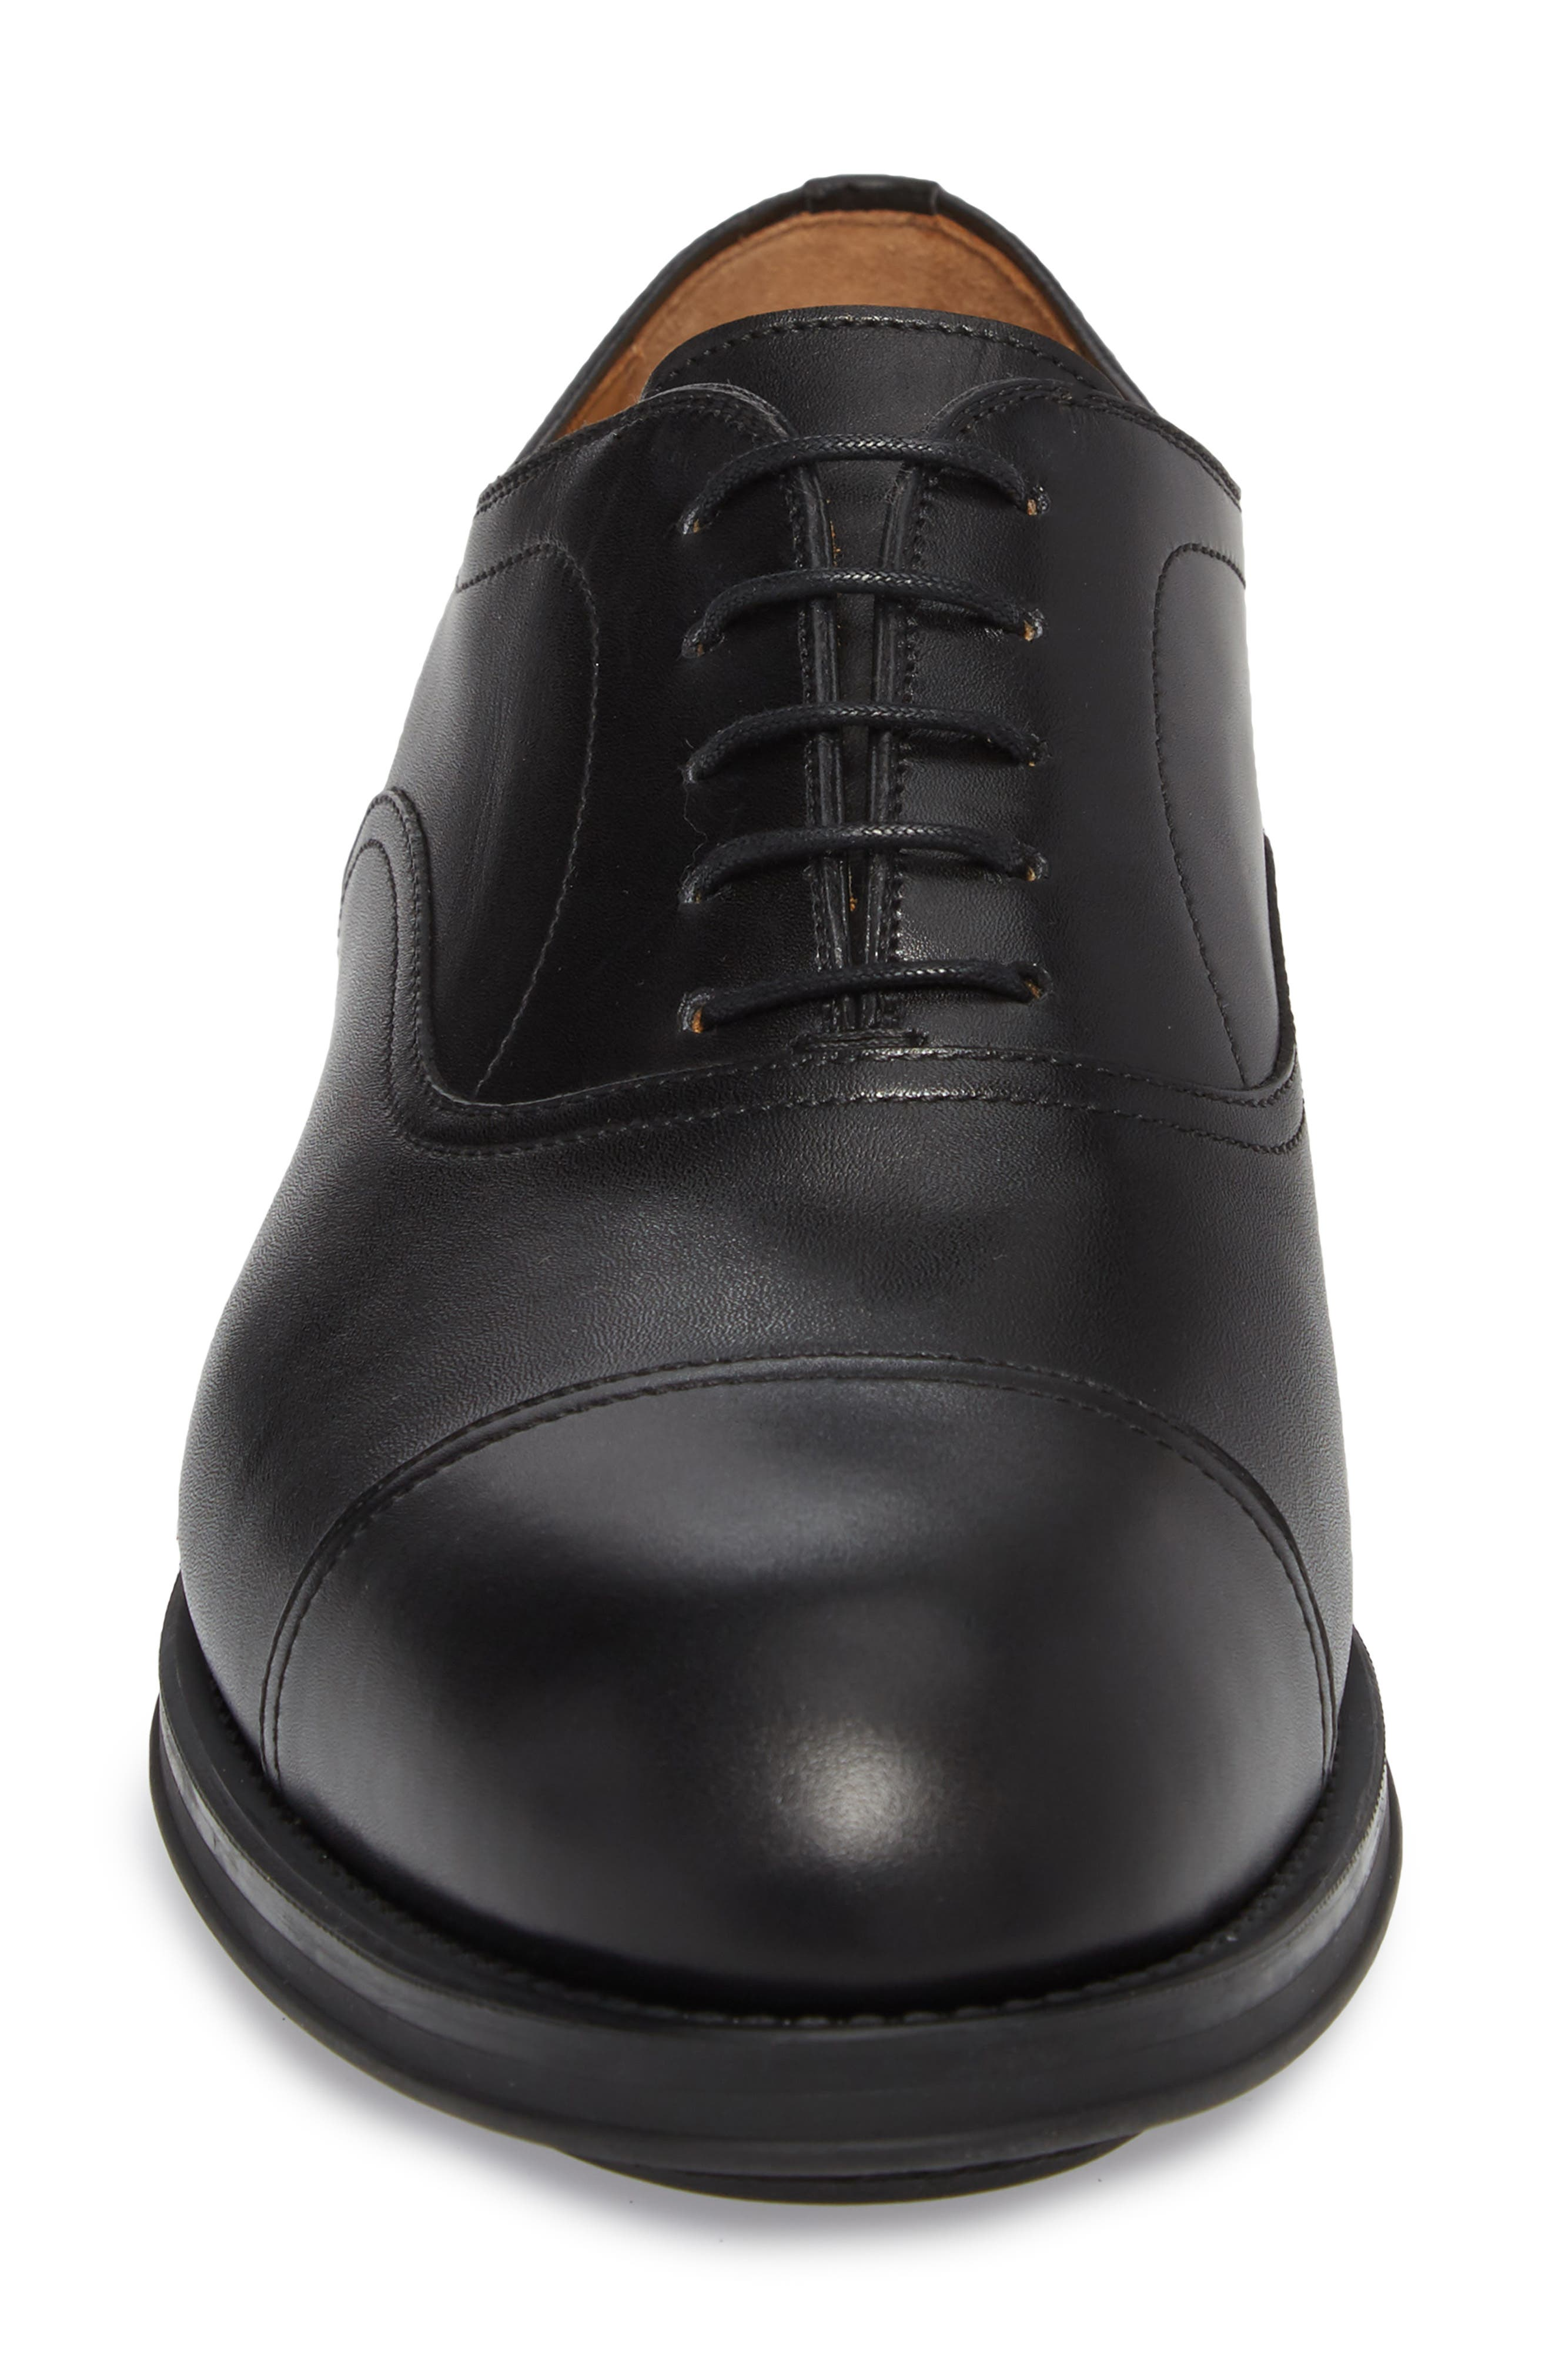 Tadeo Cap Toe Oxford,                             Alternate thumbnail 4, color,                             Black Leather